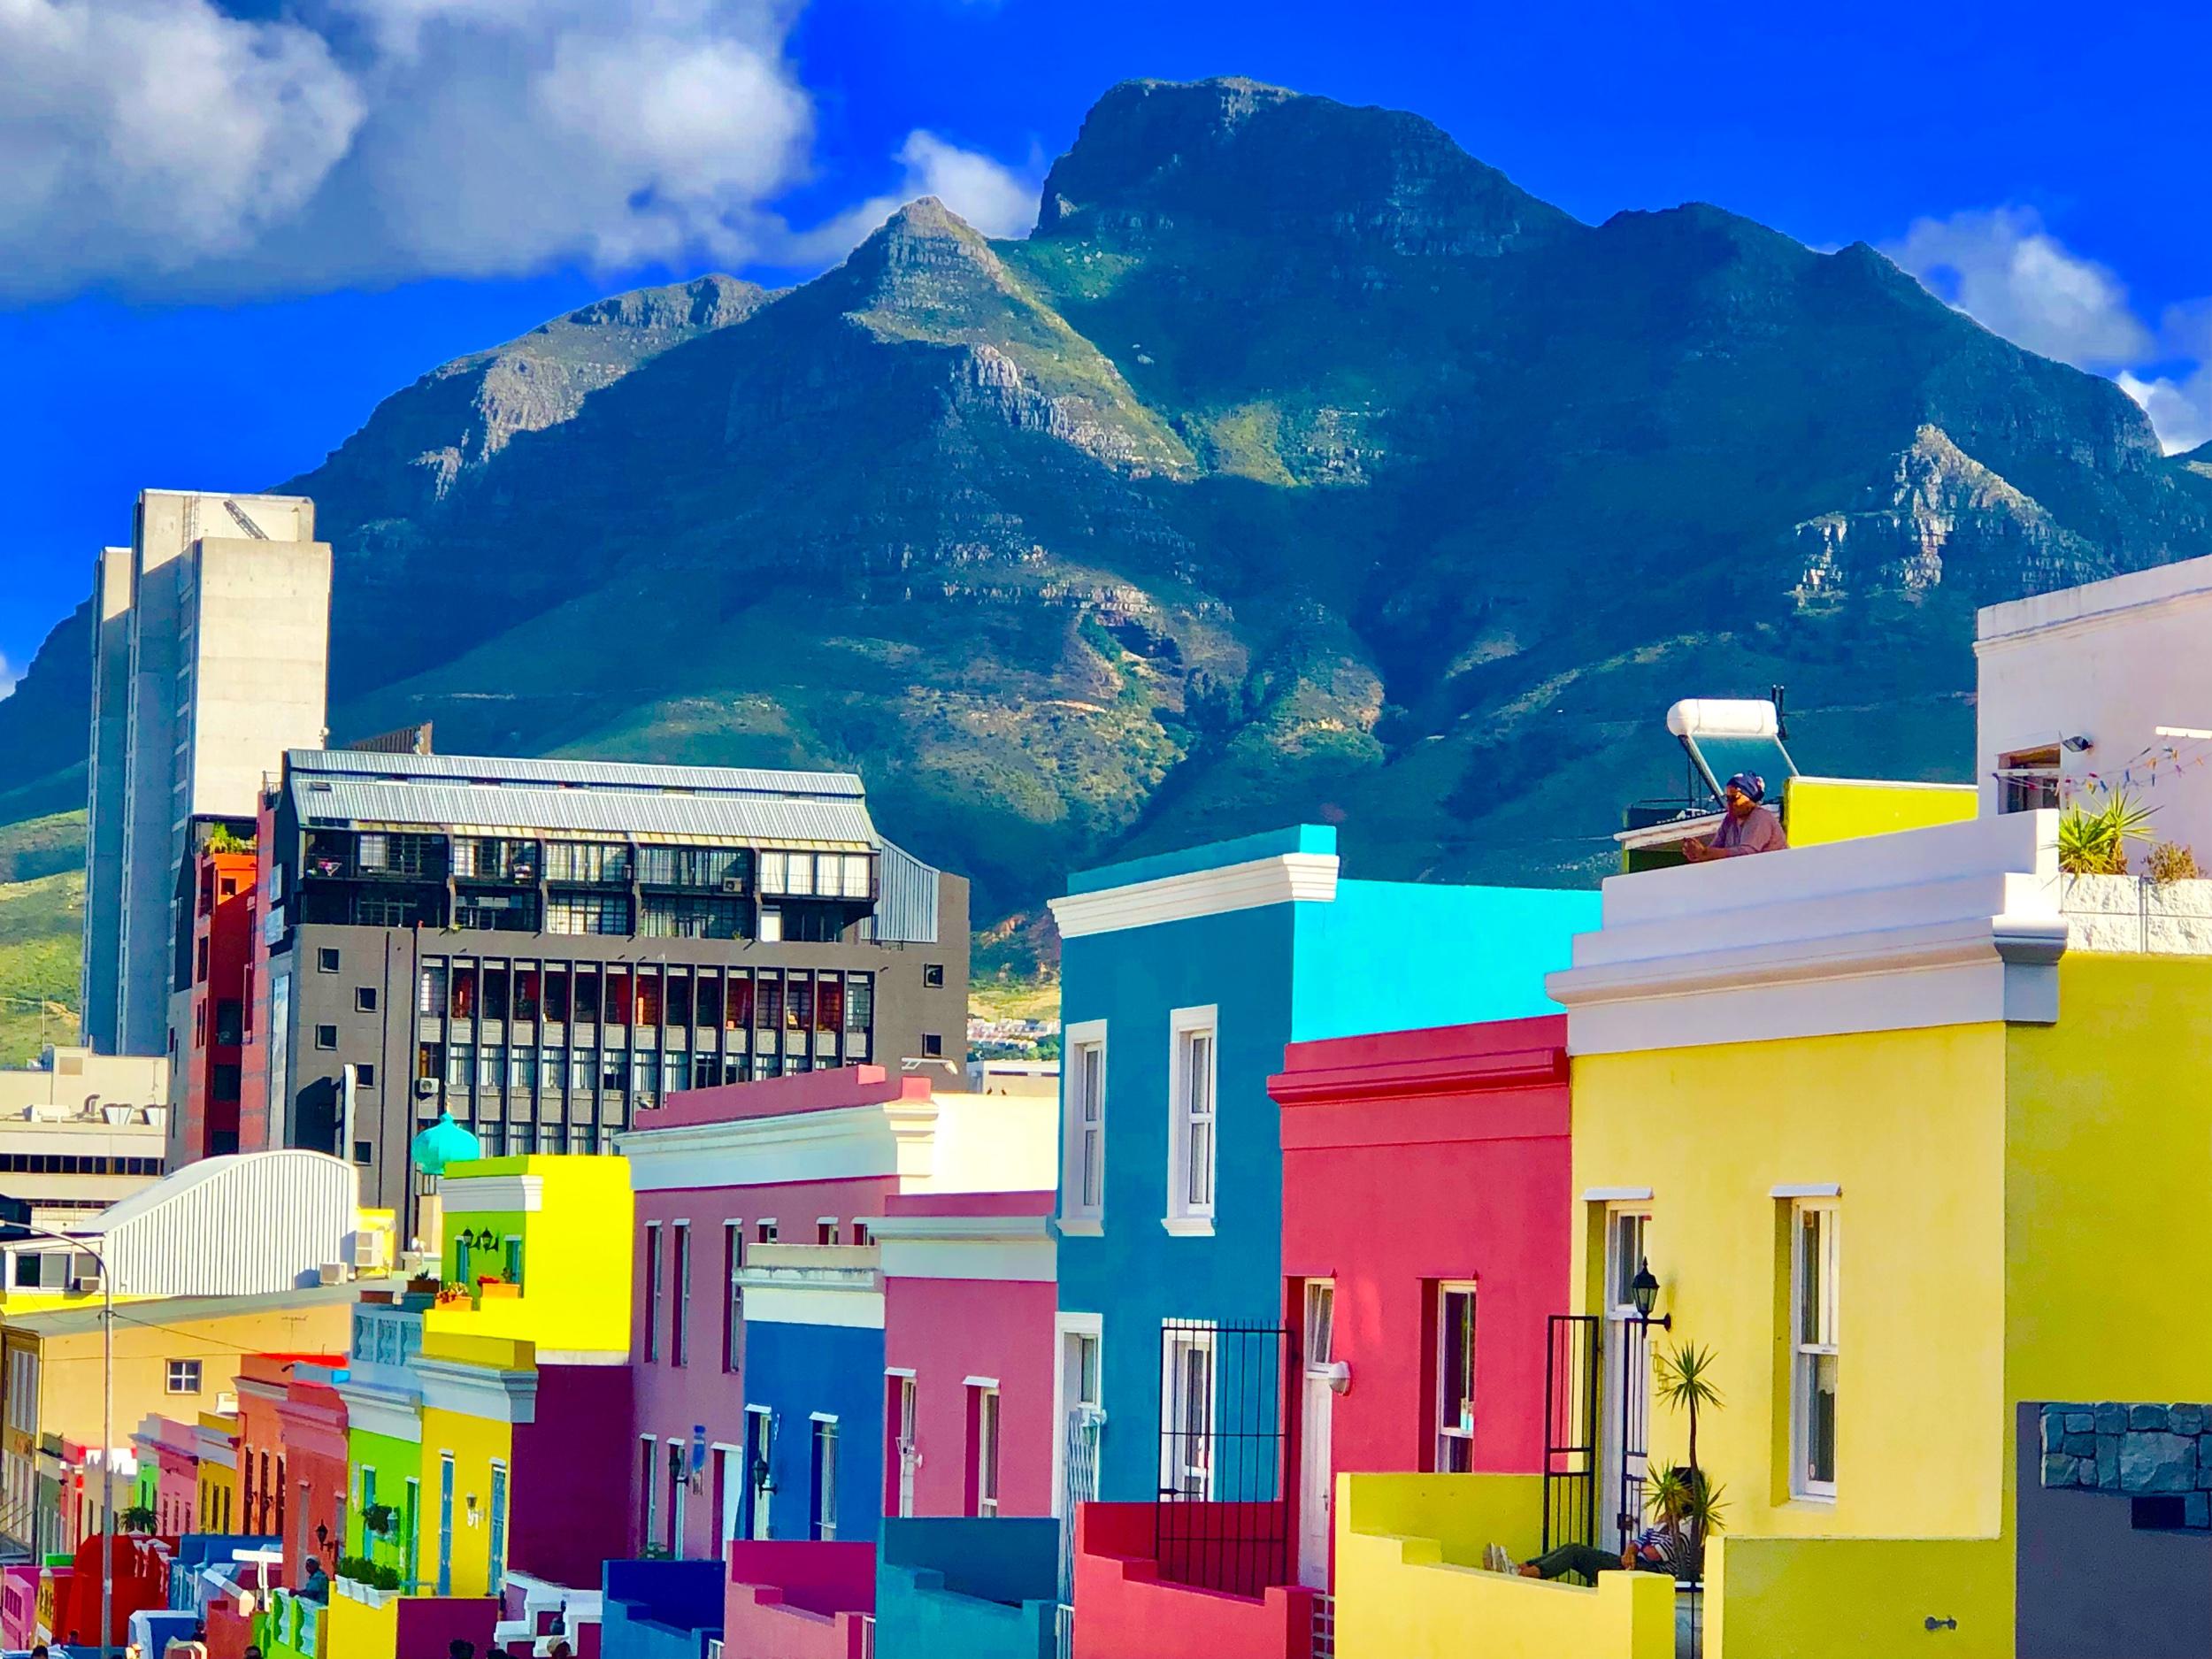 colorful houses in bo-kaap